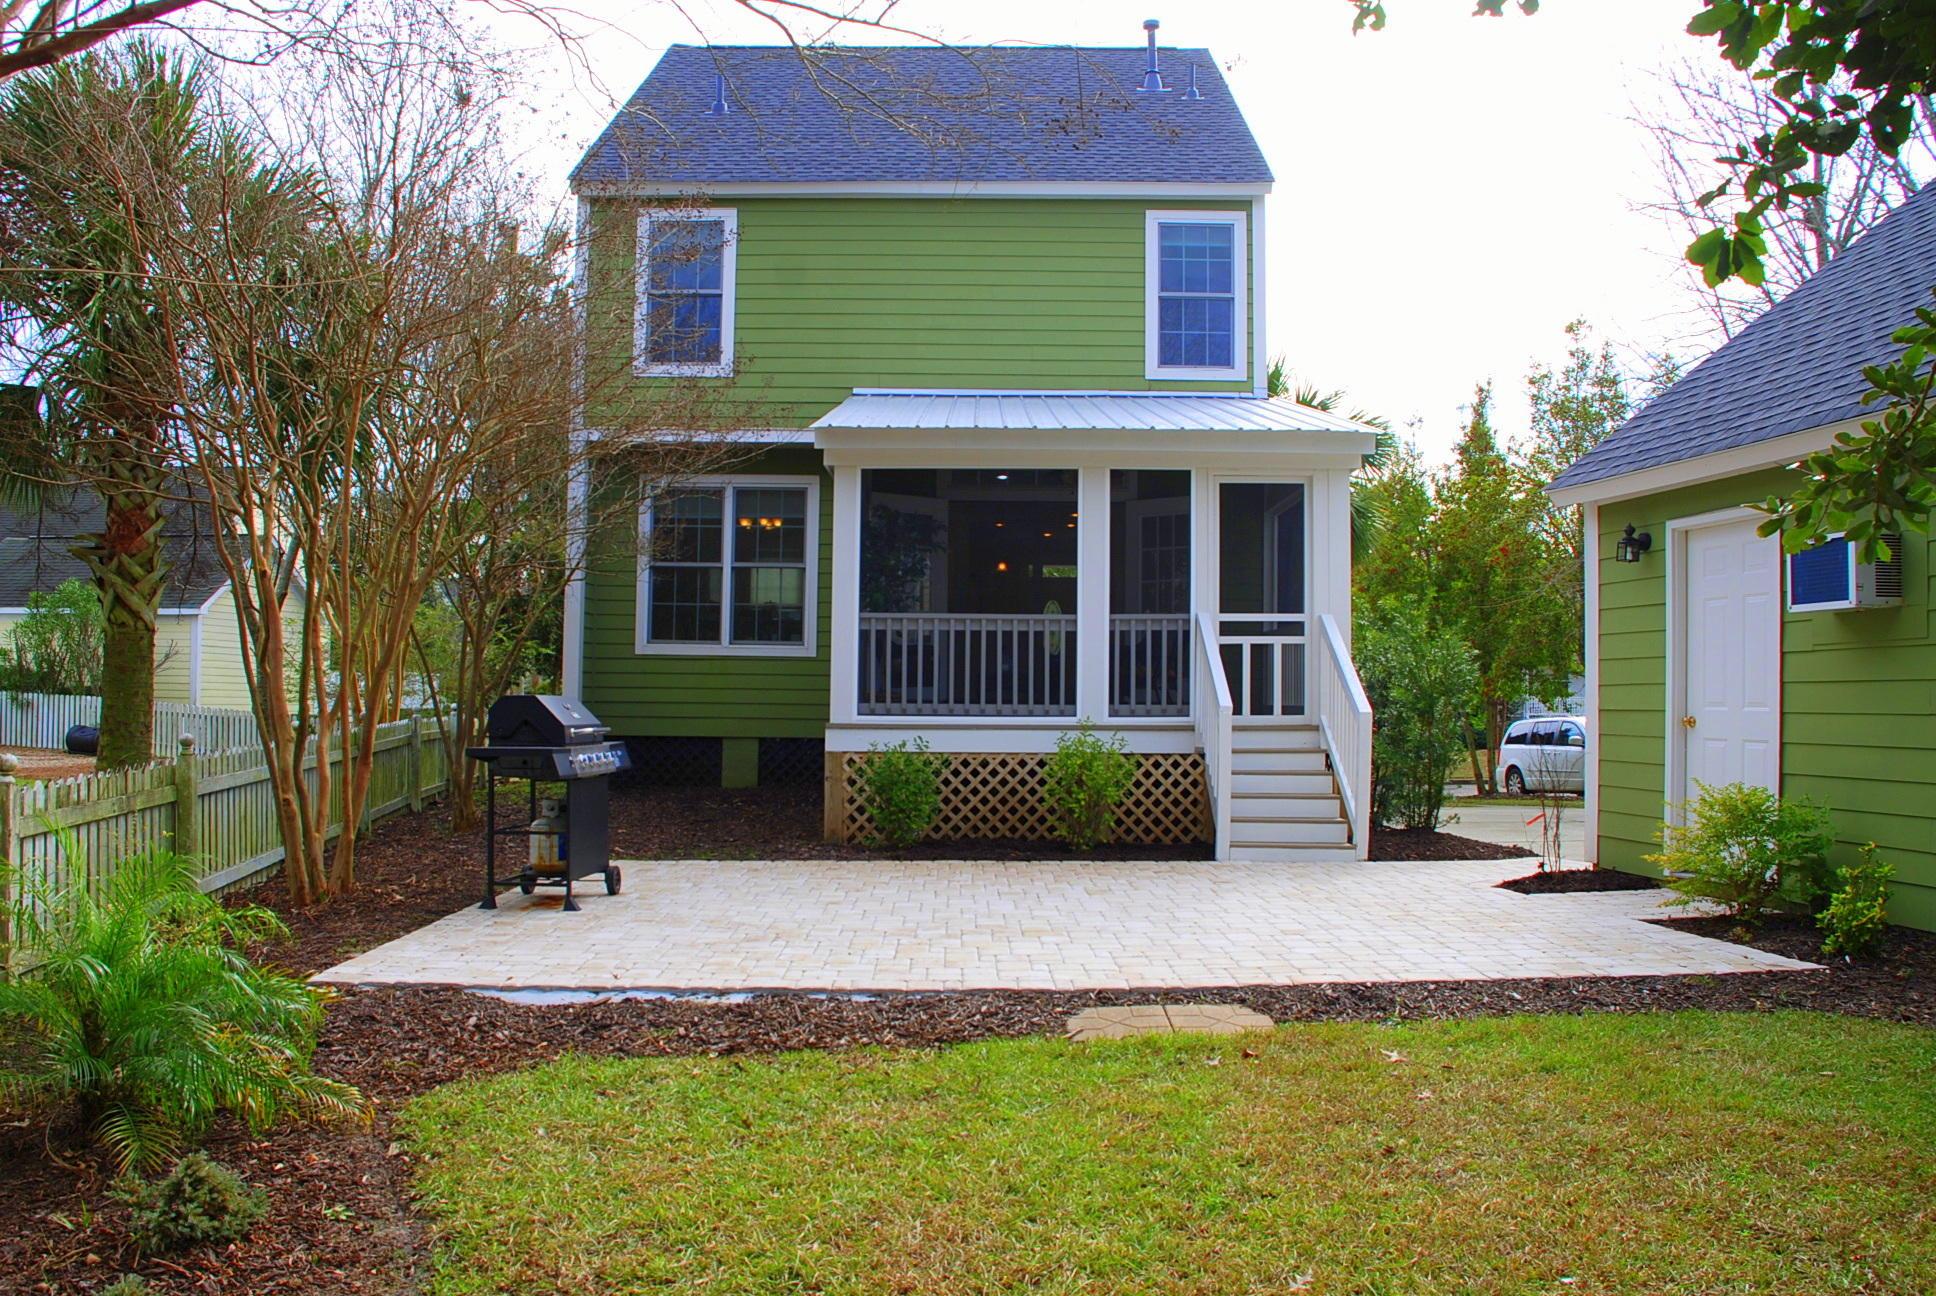 Daniel Island Homes For Sale - 100 Jordan, Daniel Island, SC - 39